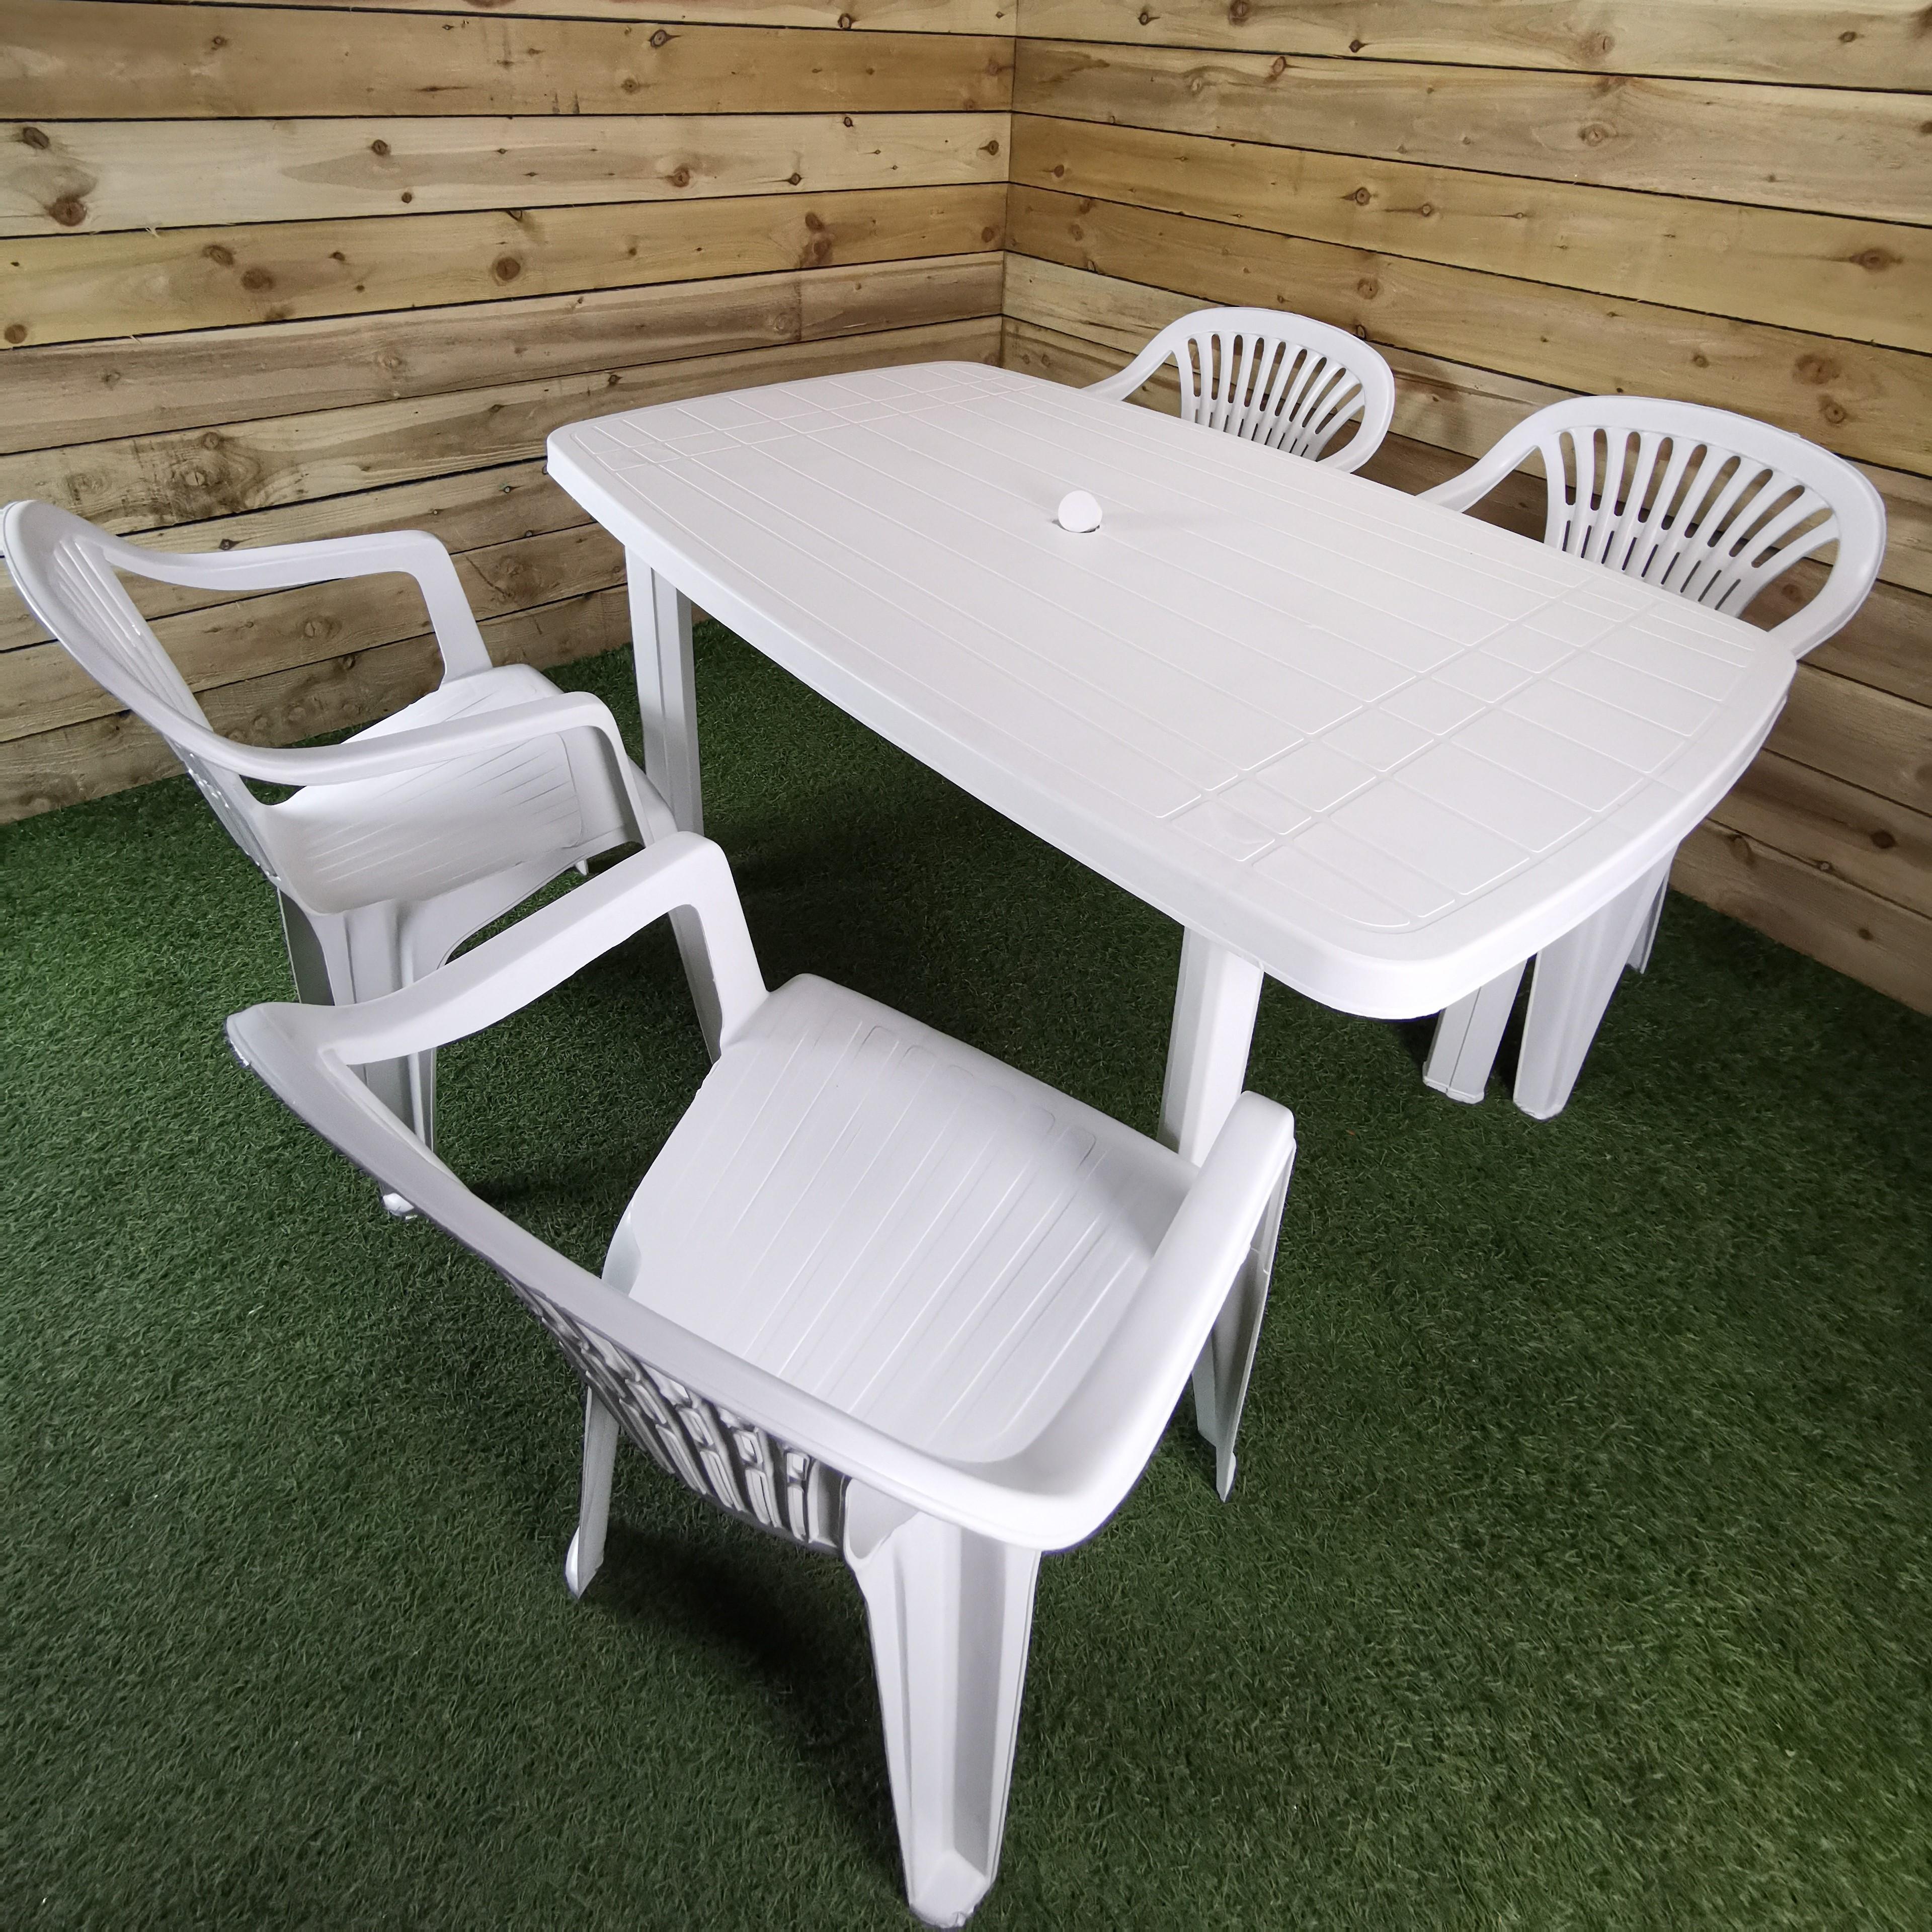 4 Person Adults White Plastic Garden Furniture Set